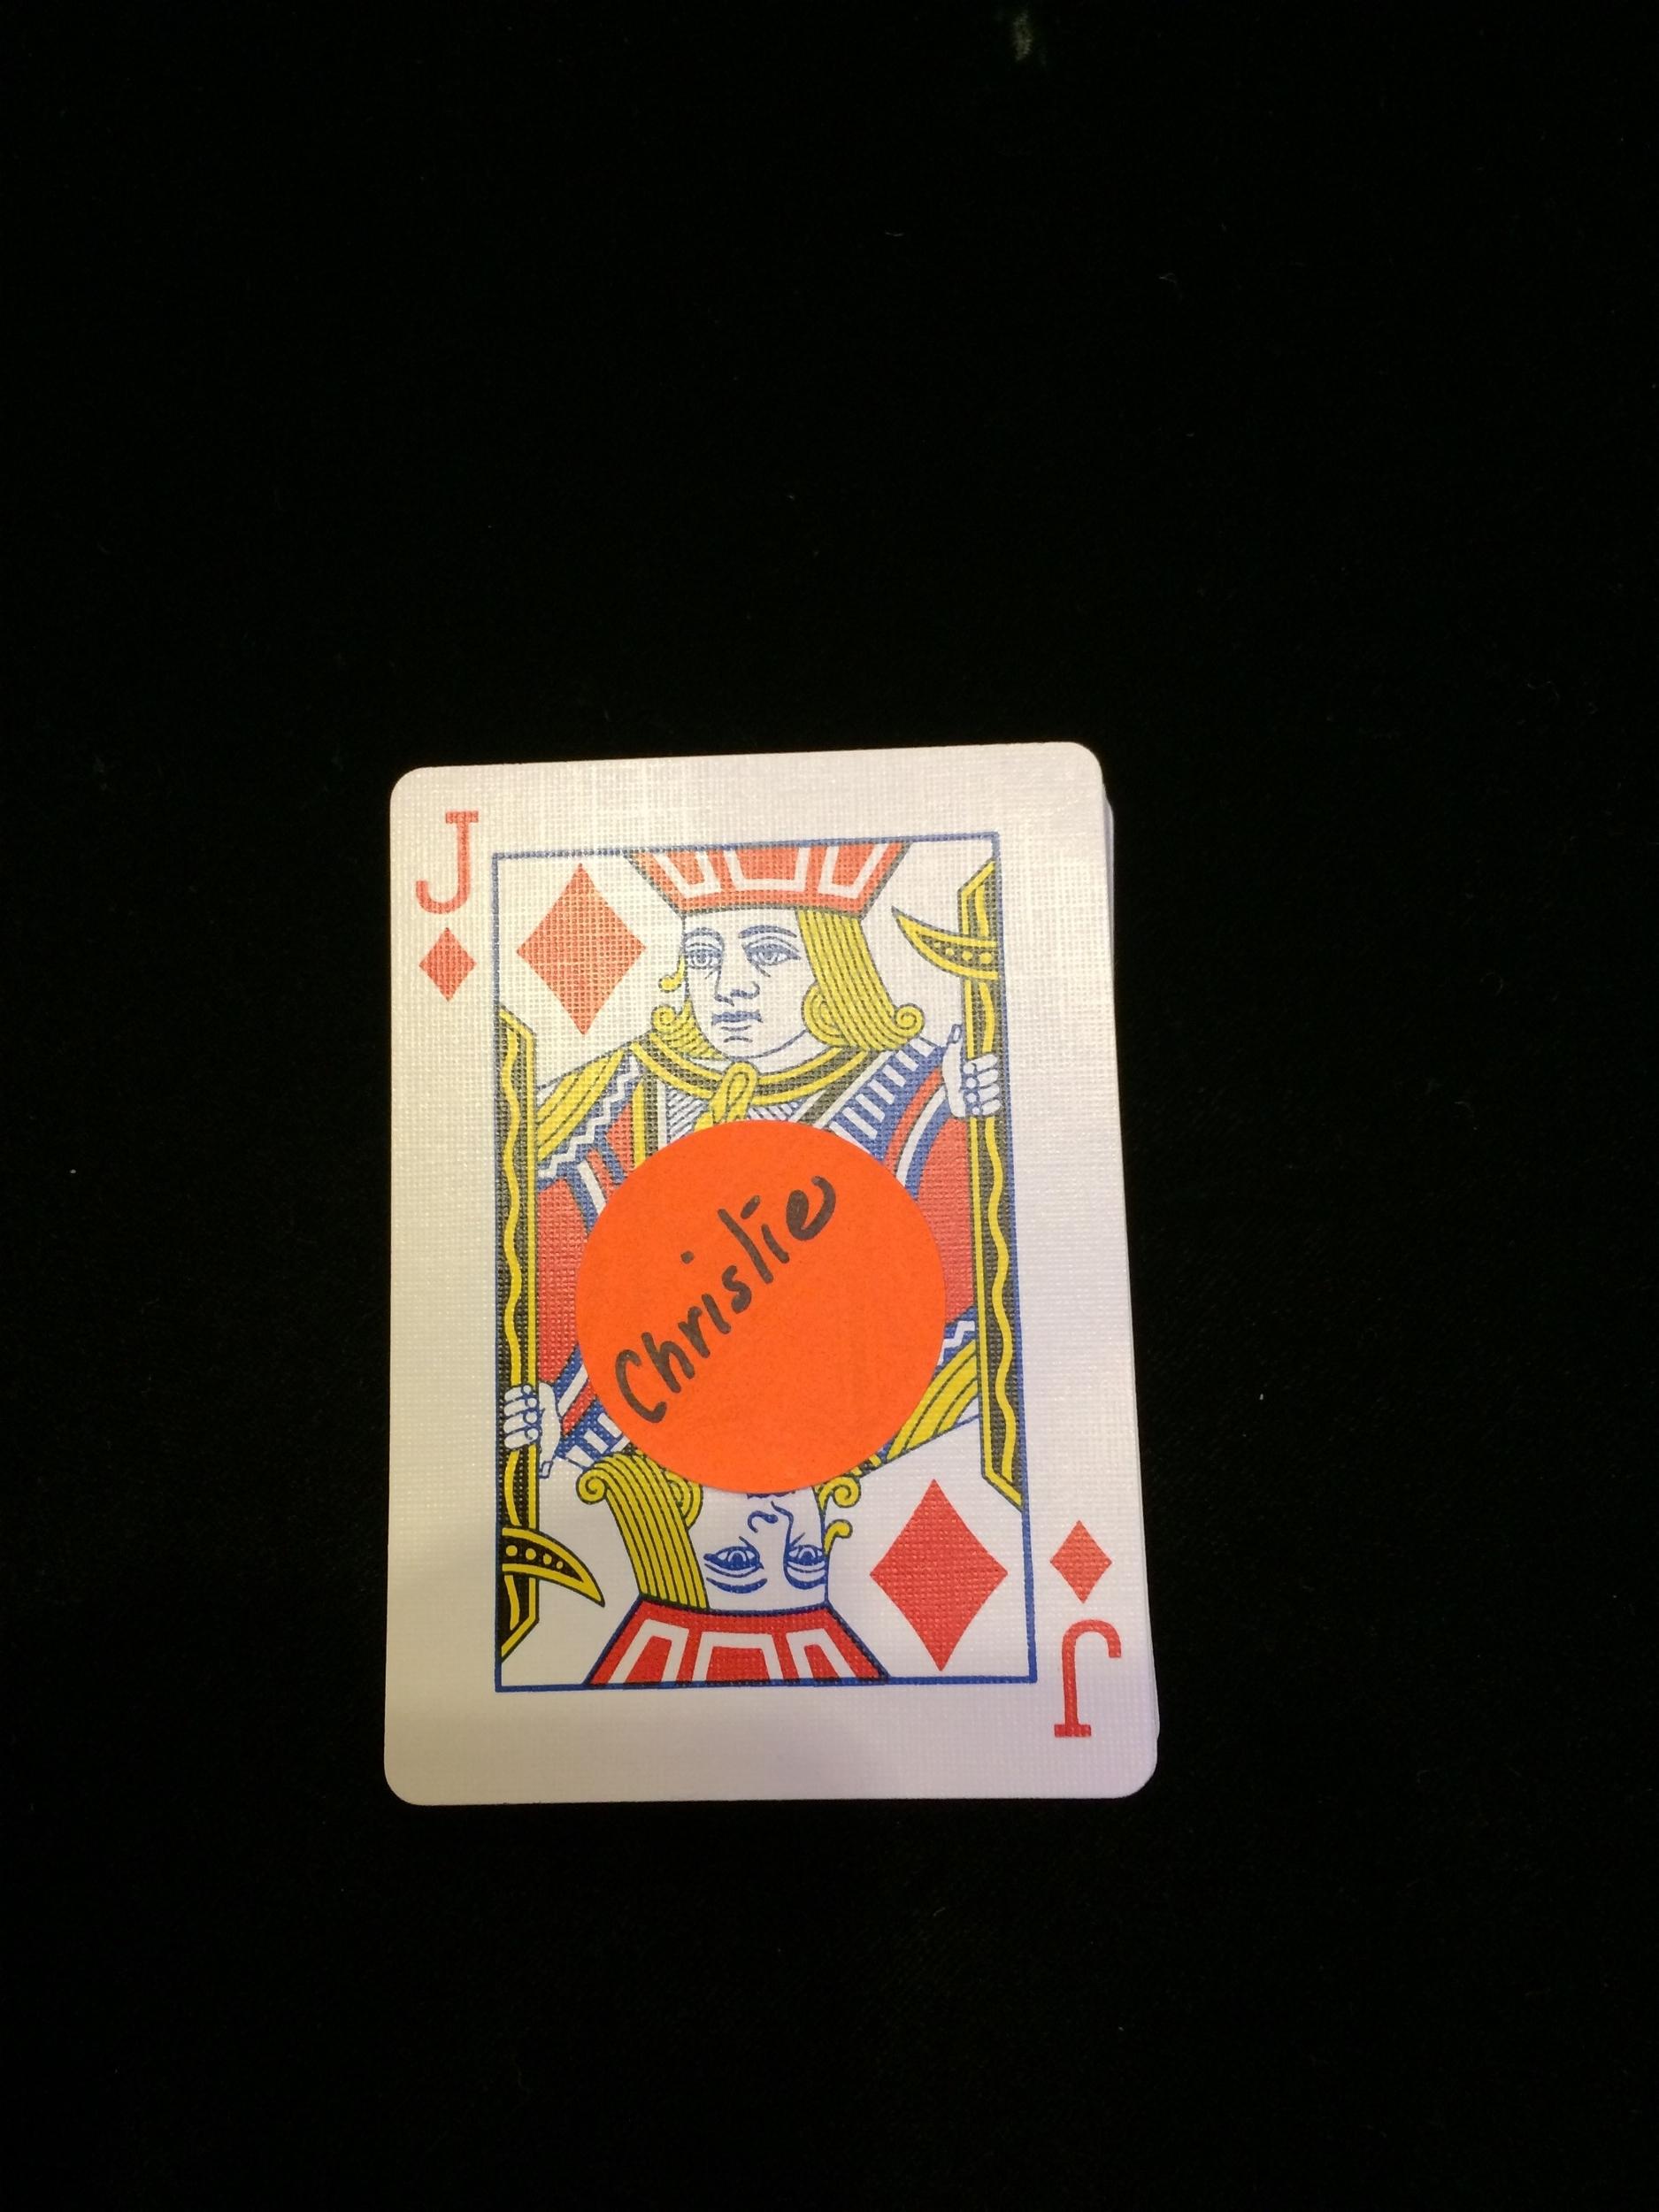 Christie Brinkley signed card